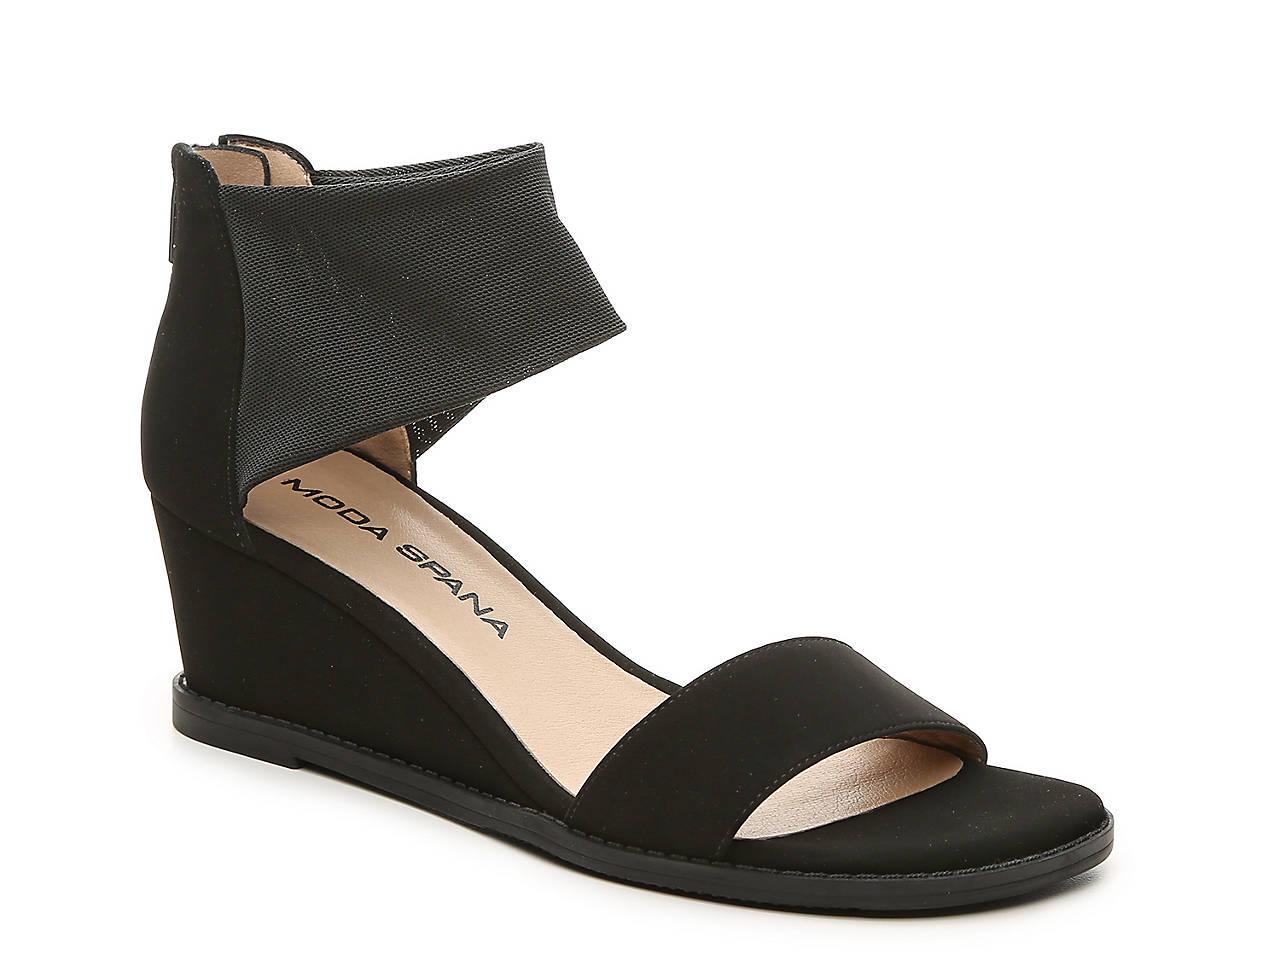 5be54182131b Moda Spana Riley Wedge Sandal Women s Shoes